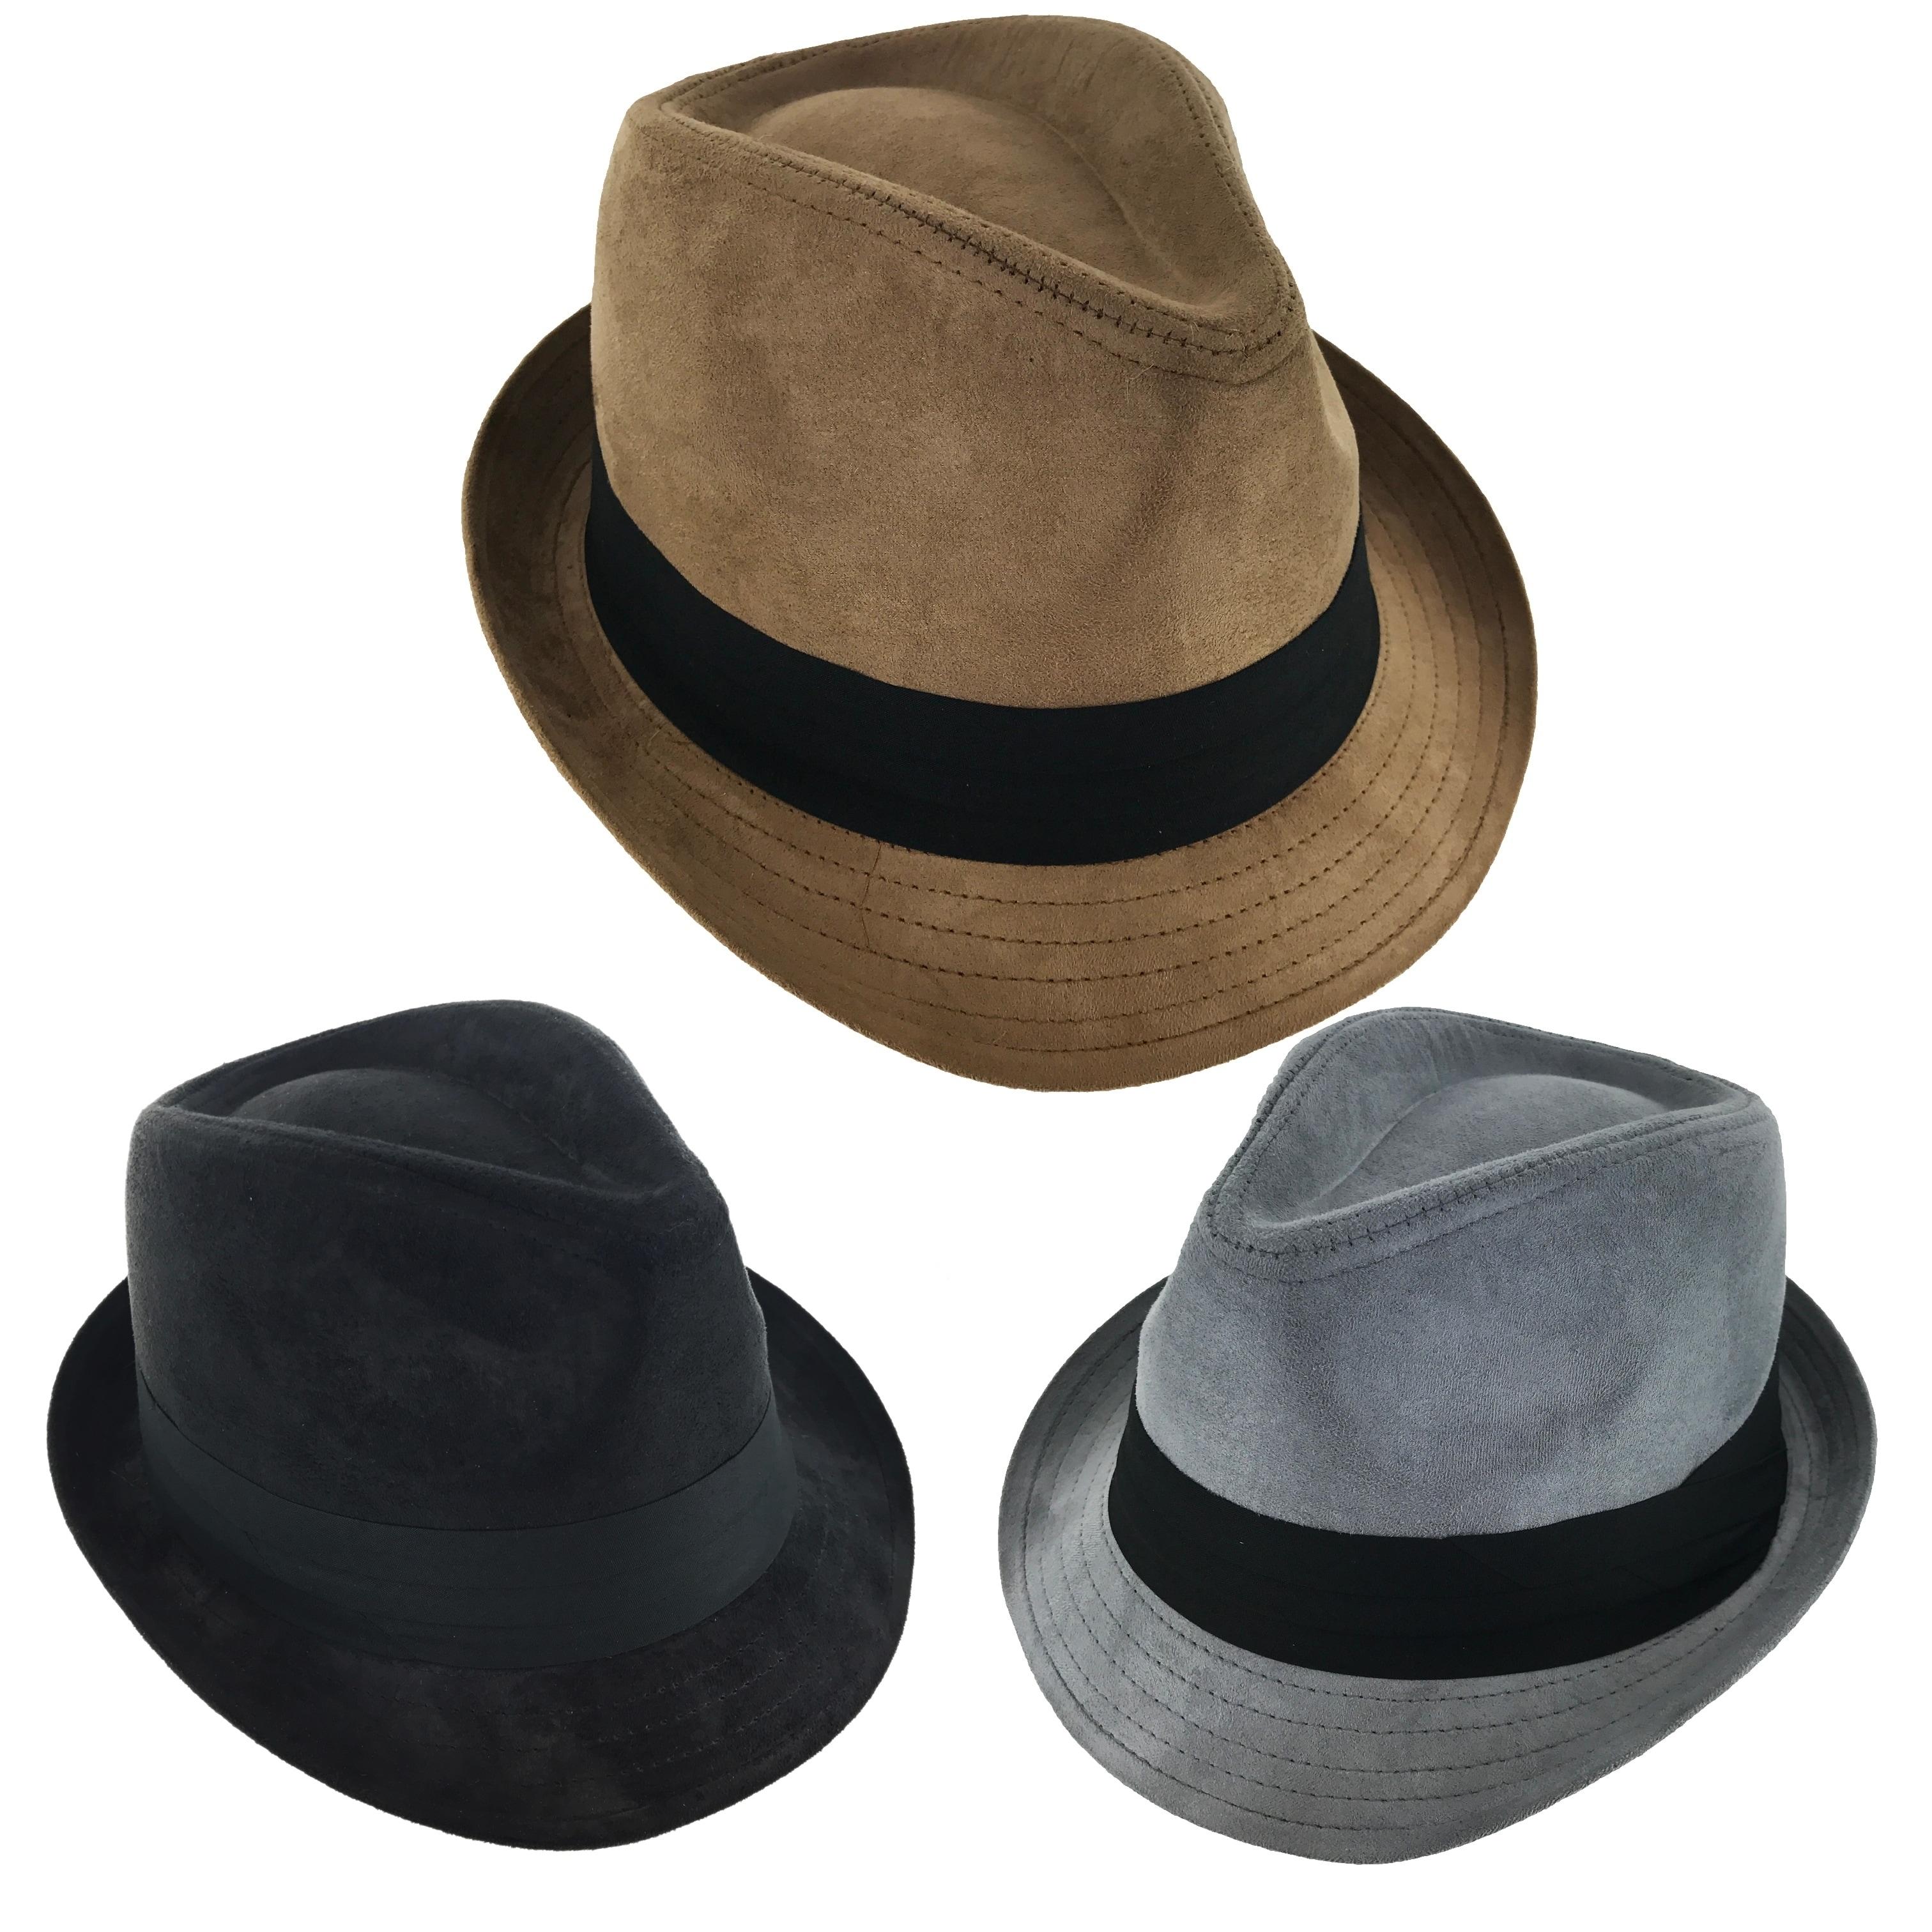 Shop Faddism London Classic 195 Retro Fashion Velvet Fedora Hat ... 2bb3449b132